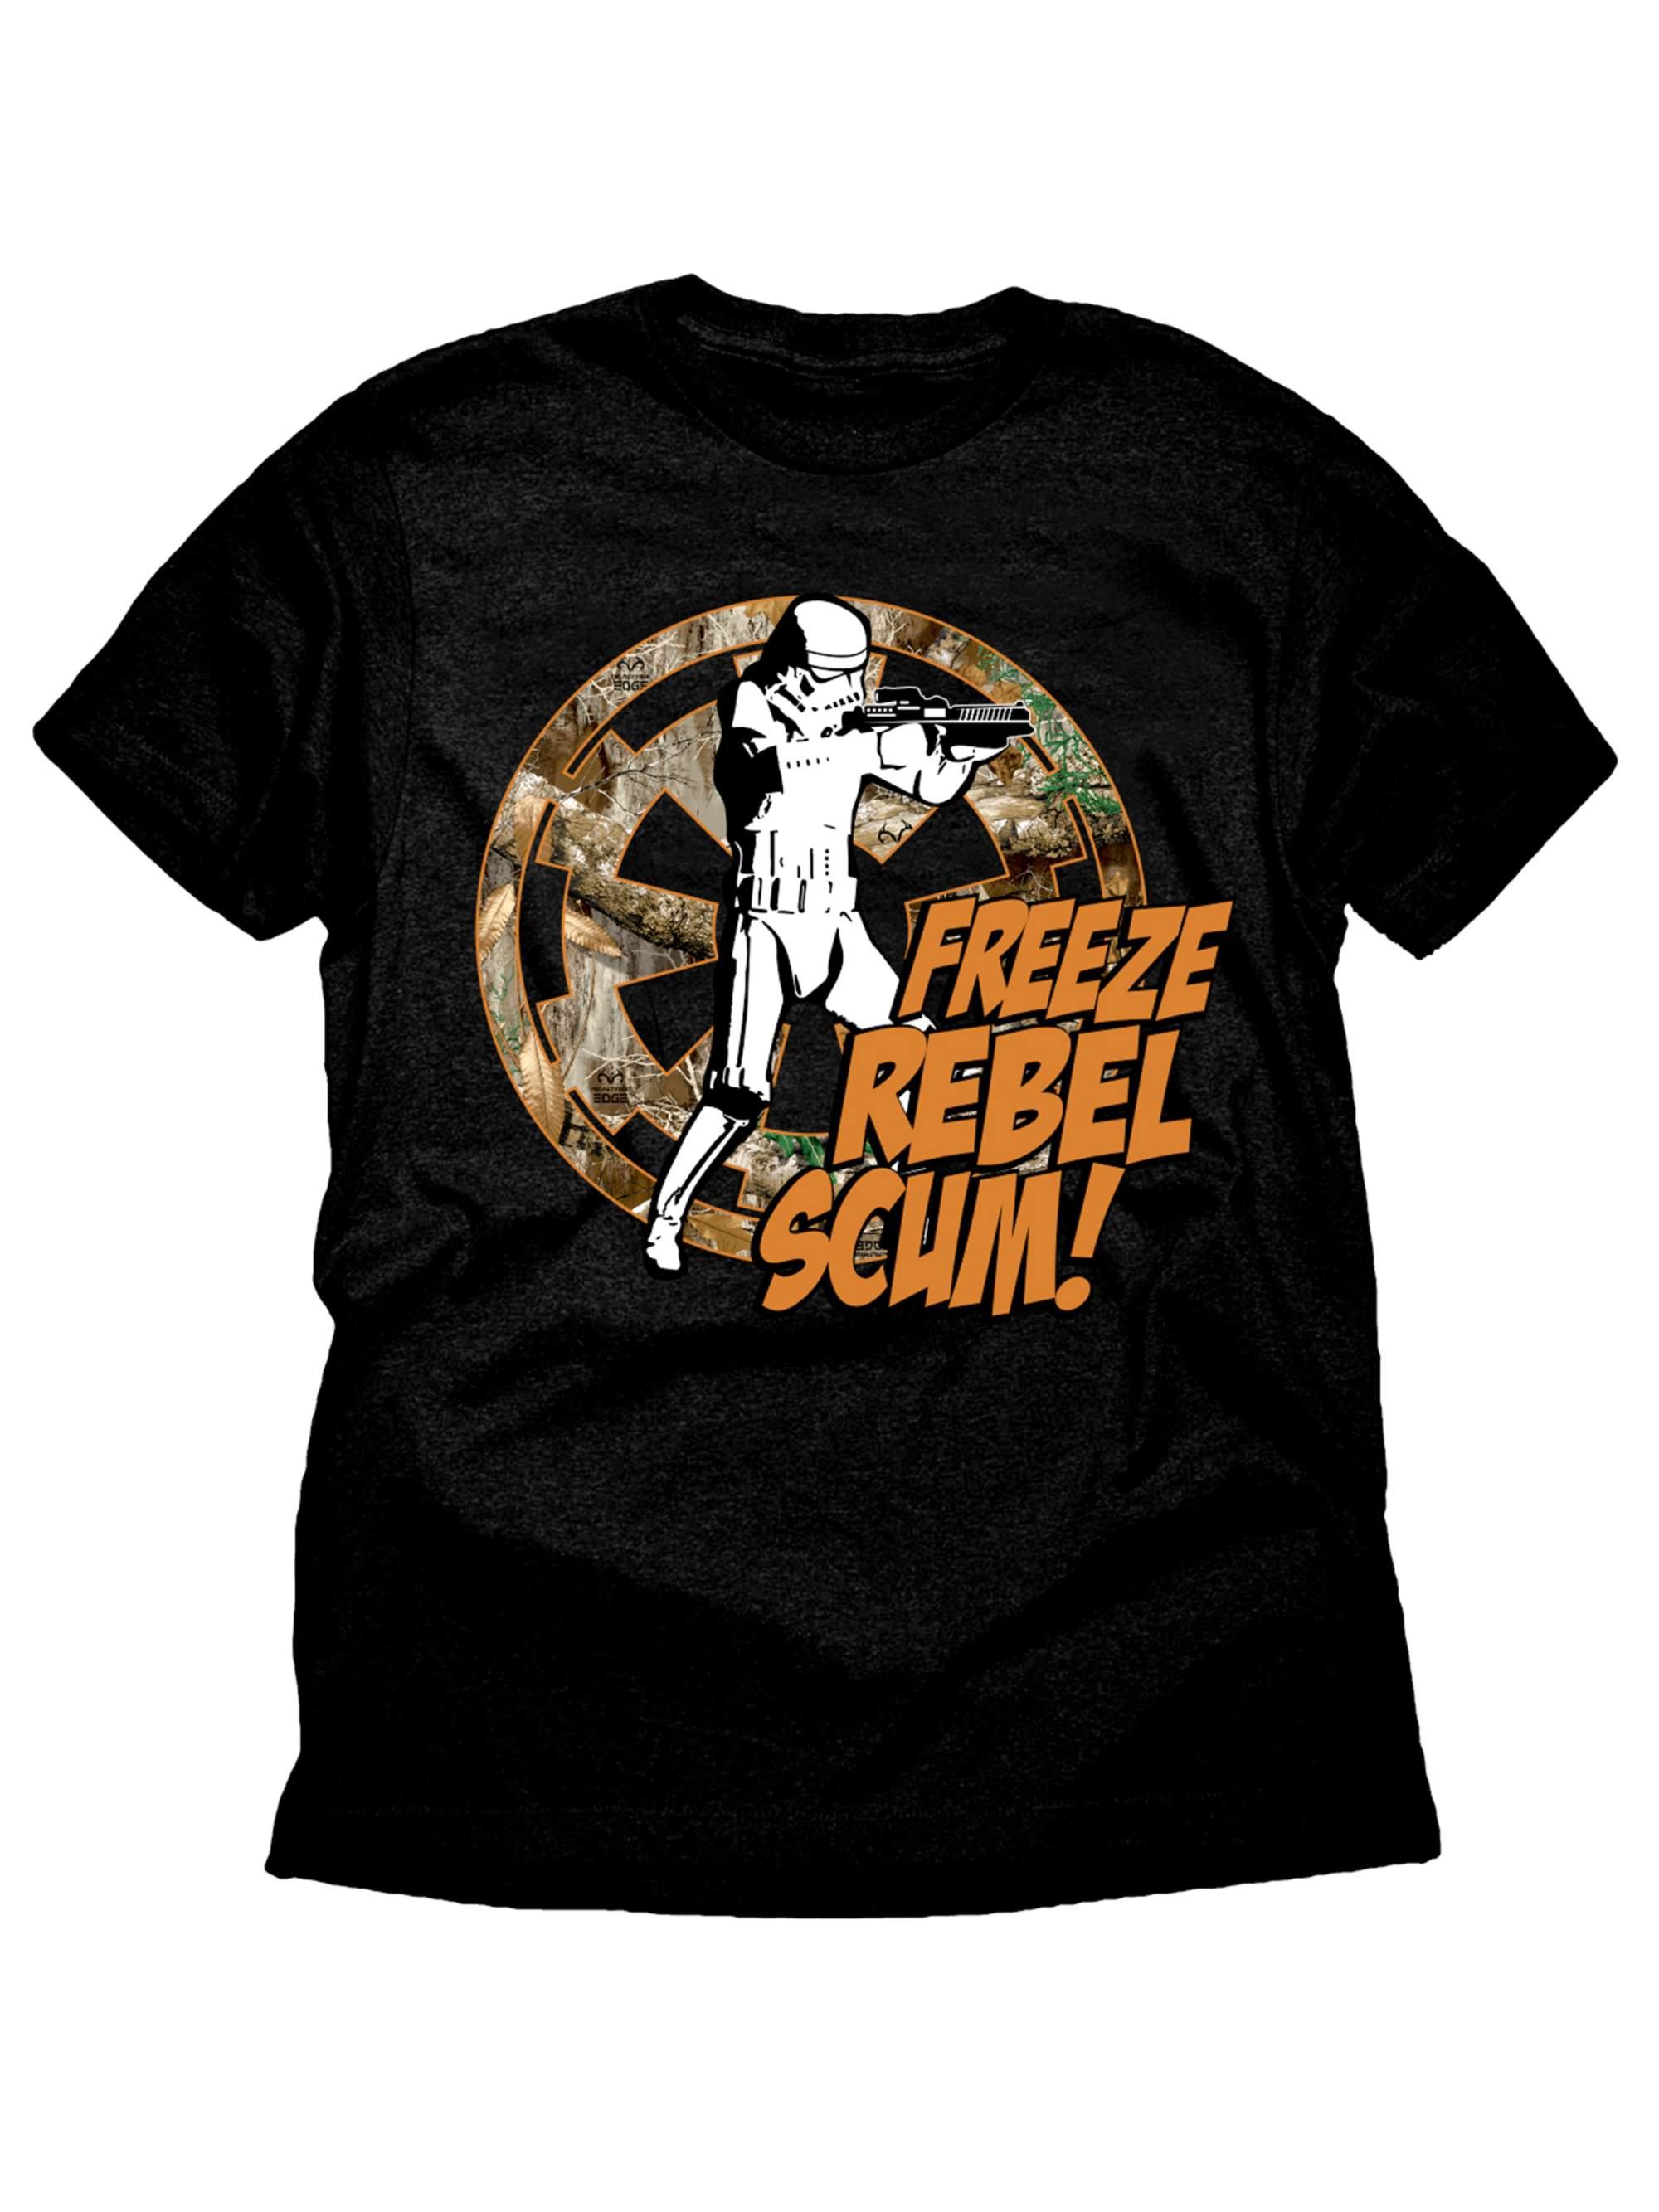 Star Wars Freeze Rebel Stormtrooper Realtree Boys Black Graphic T-Shirt